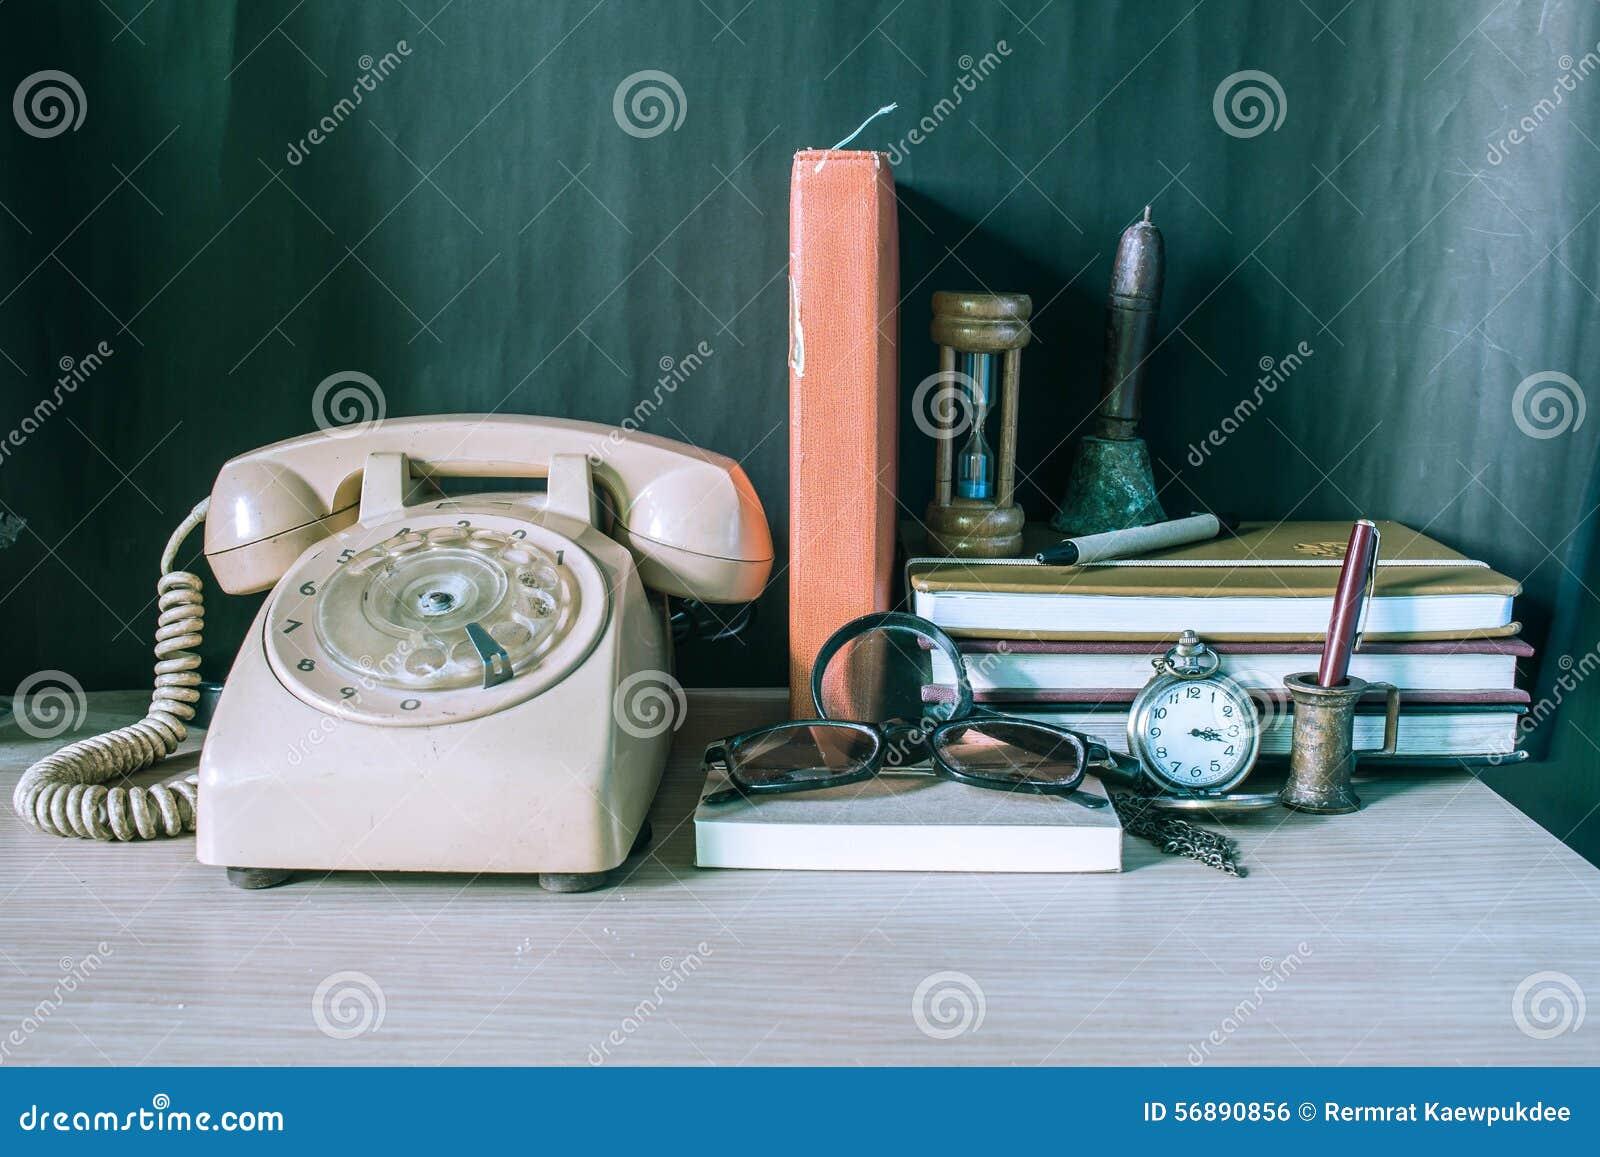 Канцелярские принадлежности и телефон на таблице